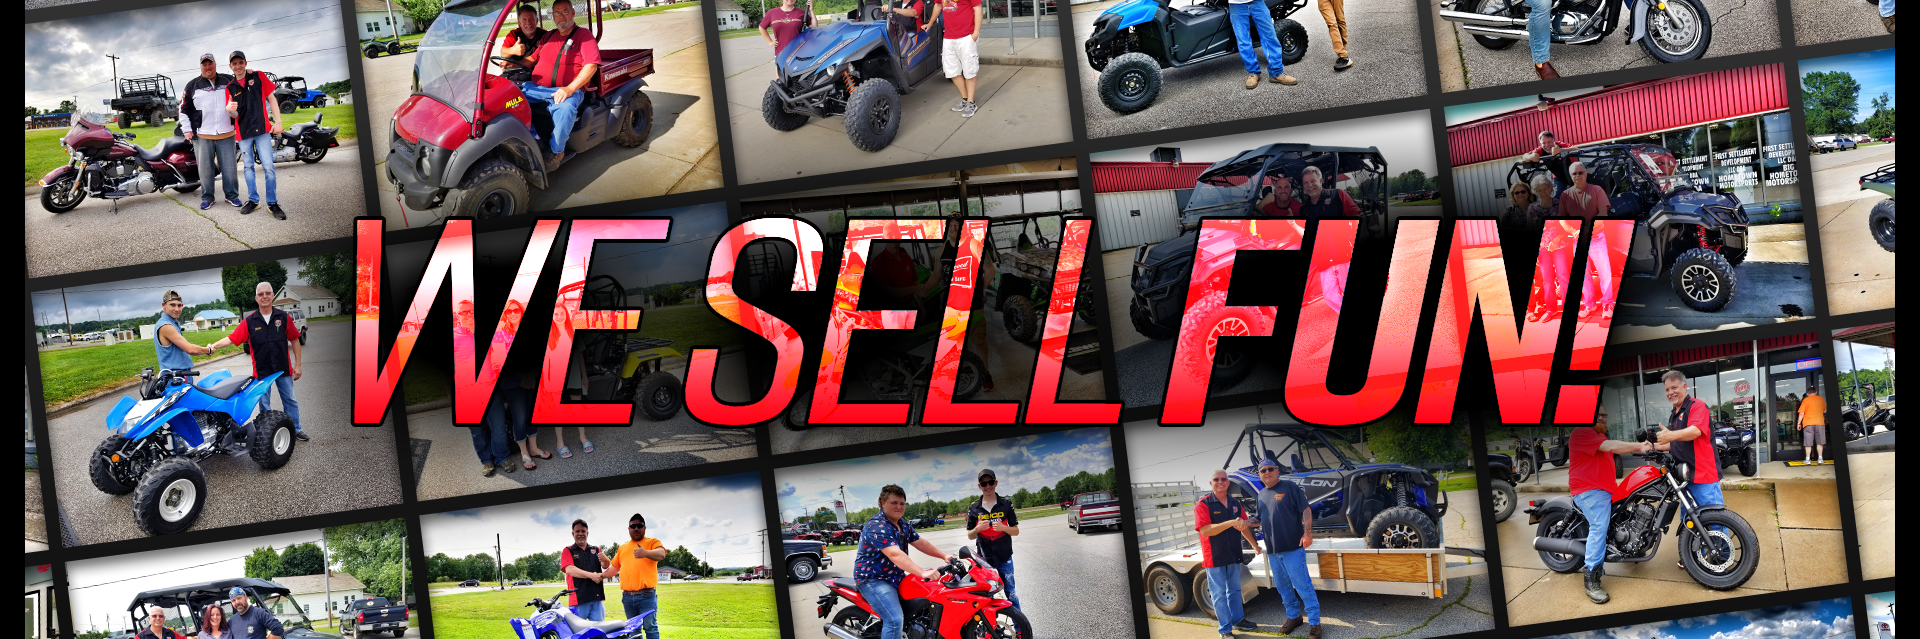 Big Hometown Motorsports | Motorcycles, ATVs, UTVs in